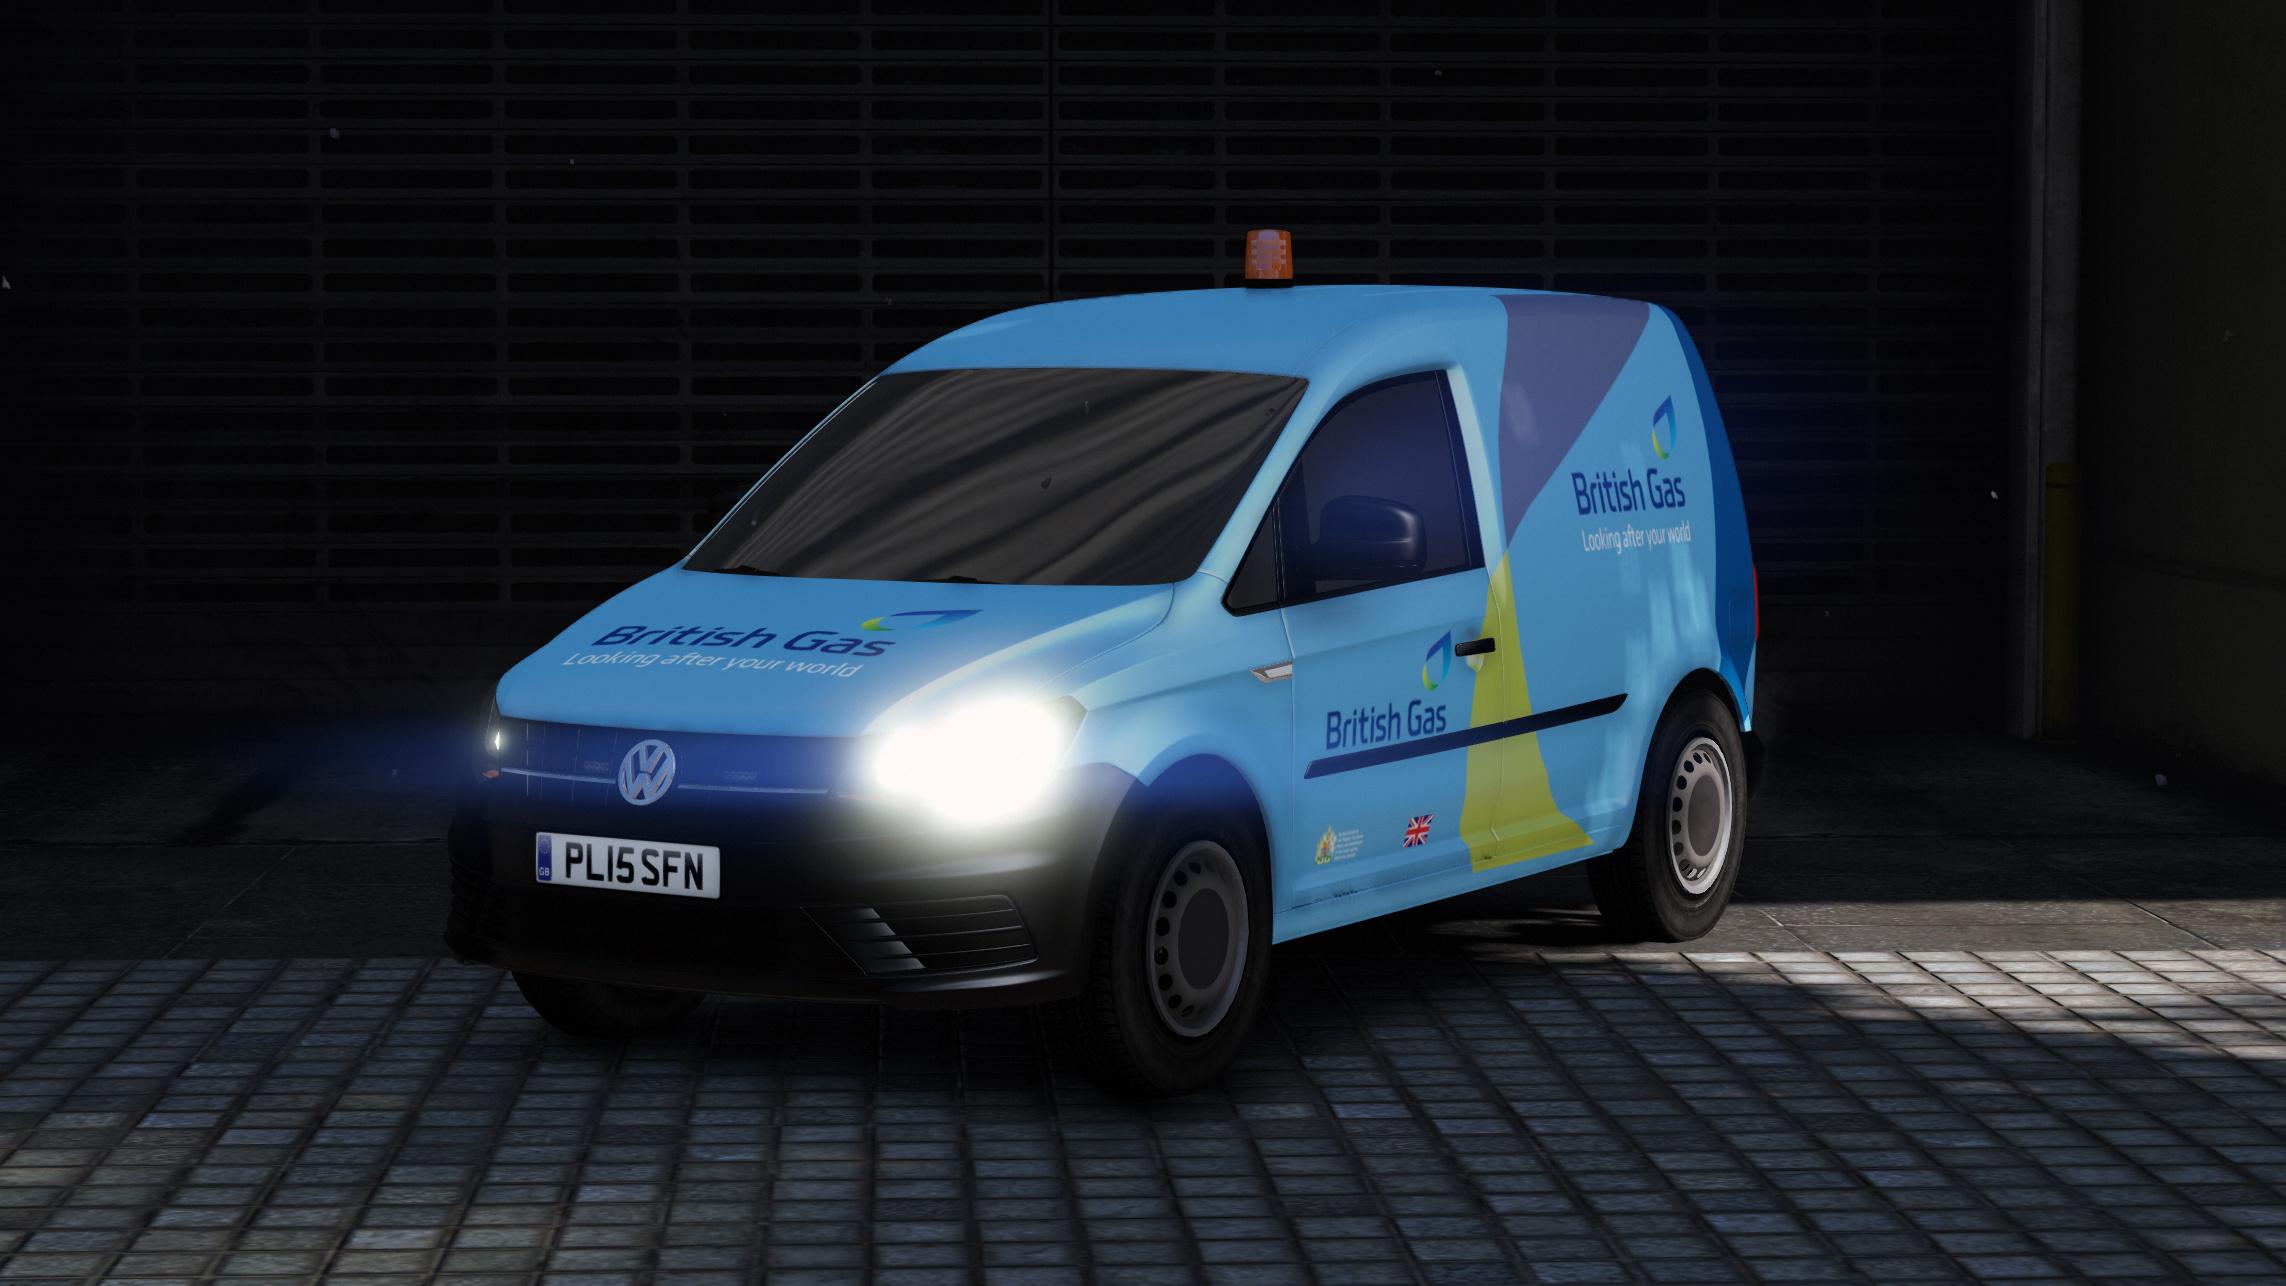 British Gas Volkswagen Caddy Skin - GTA5-Mods.com